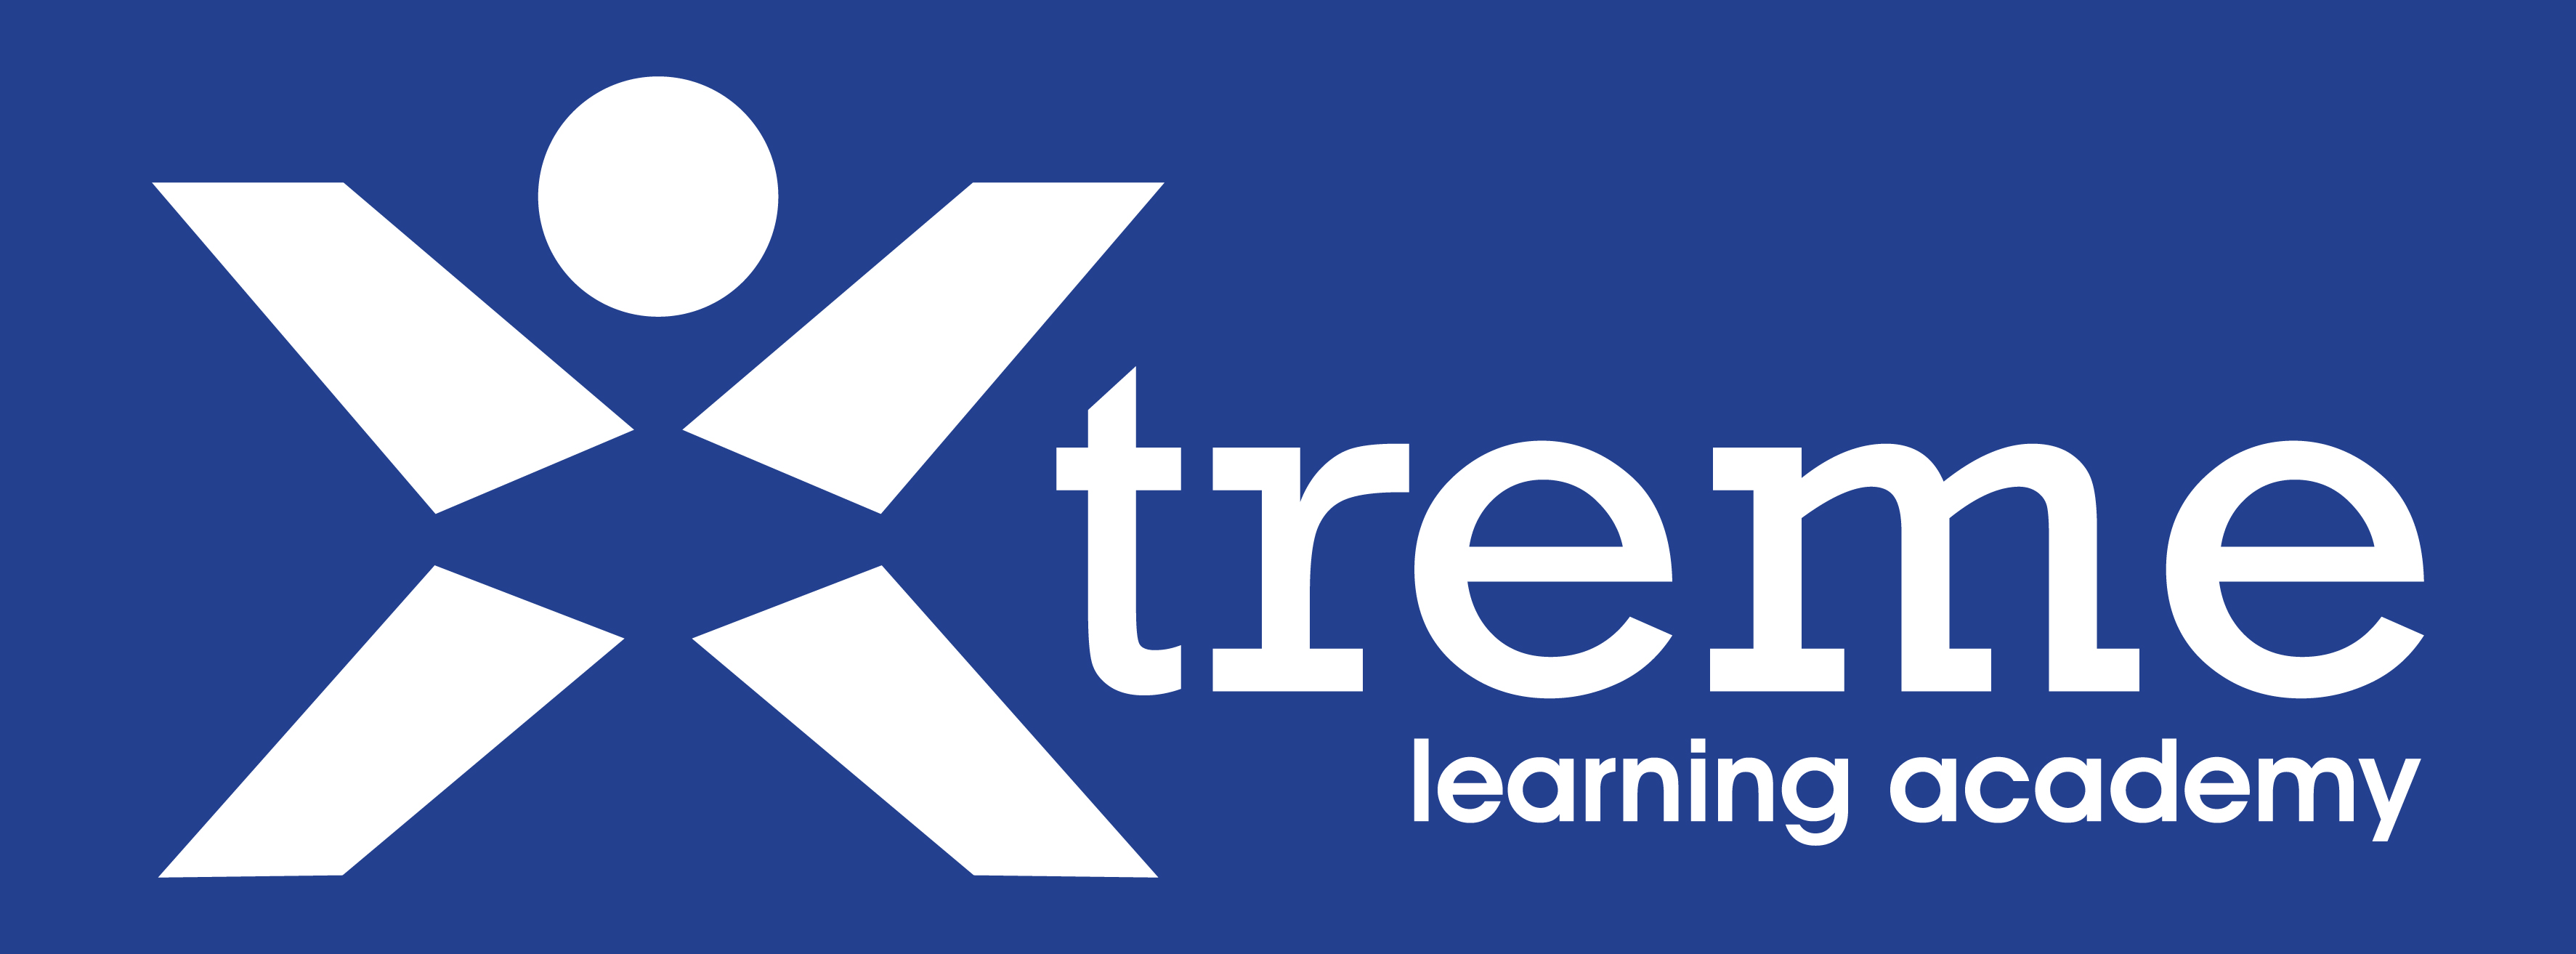 Foto de Xtreme Learning Academy Port Elizabeth